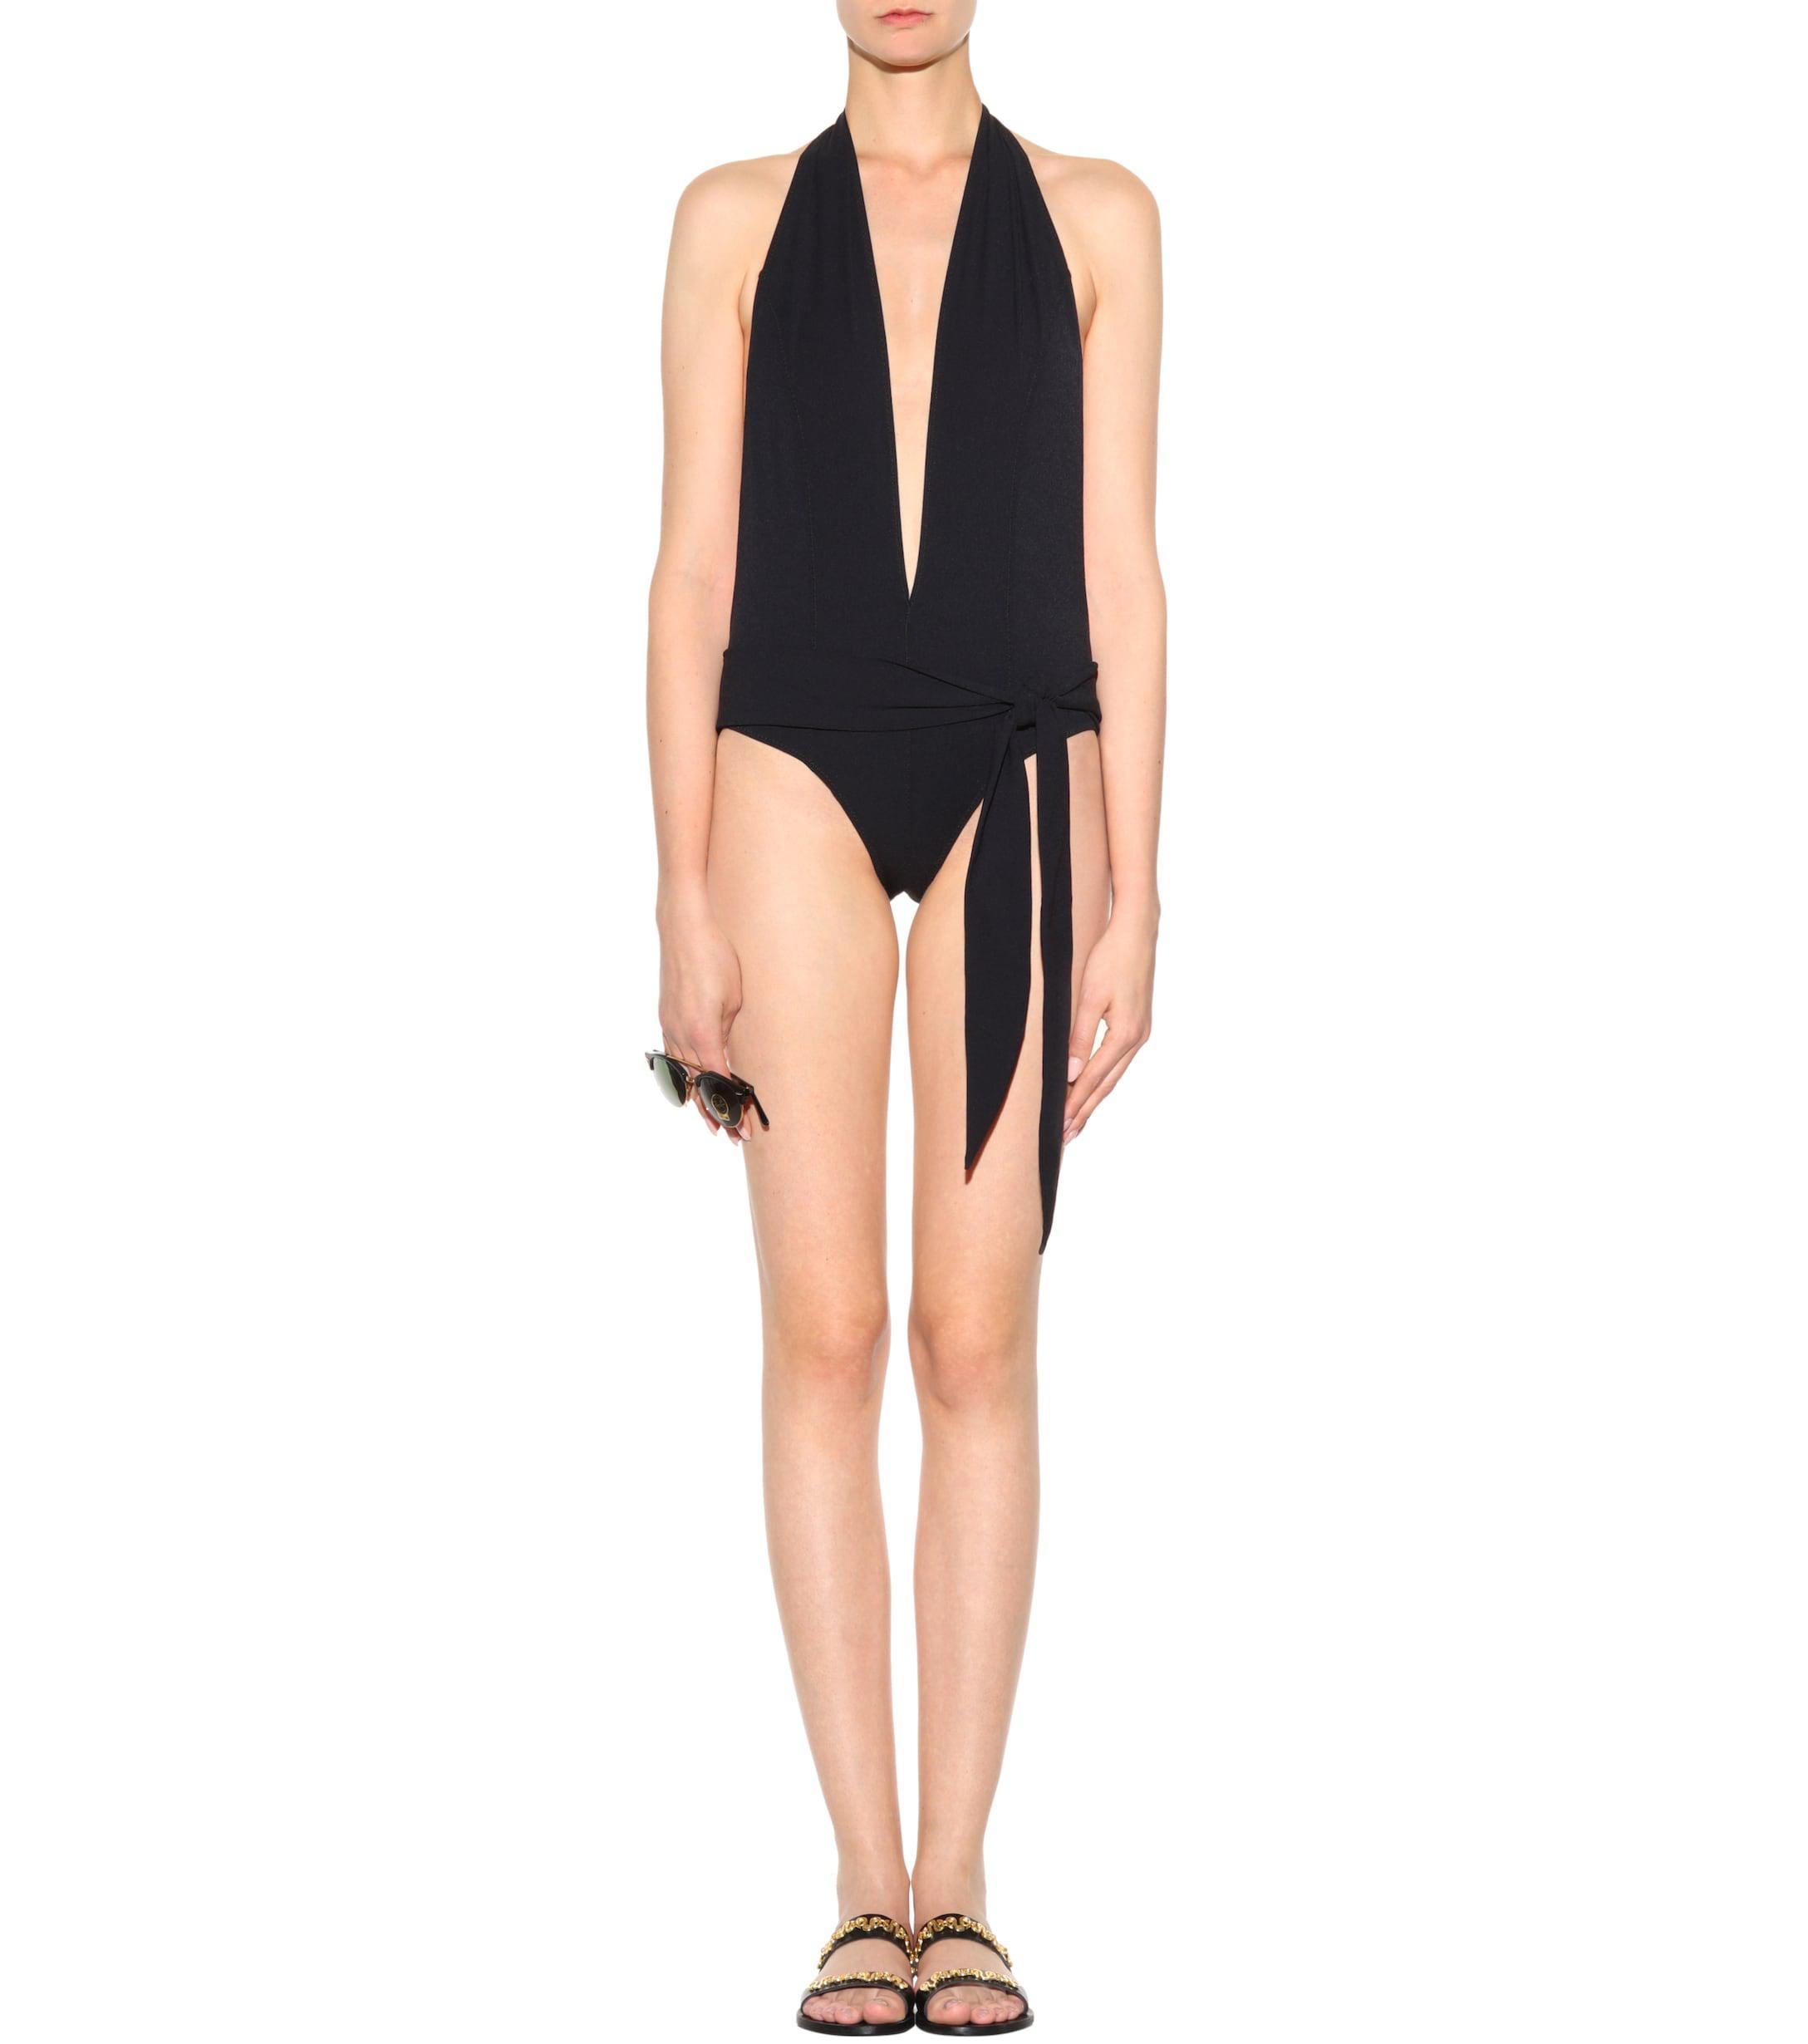 b46b6dcb6c Lisa Marie Fernandez - Black Riri Maillot Swimsuit - Lyst. View fullscreen